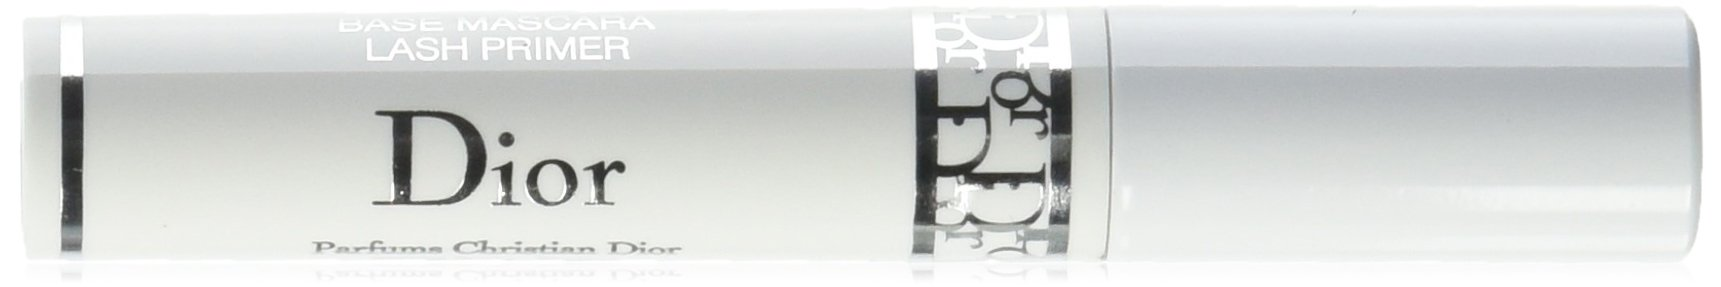 Diorshow Maximizer 3D Triple volume plumping lash primer - 0.05 fl. oz.